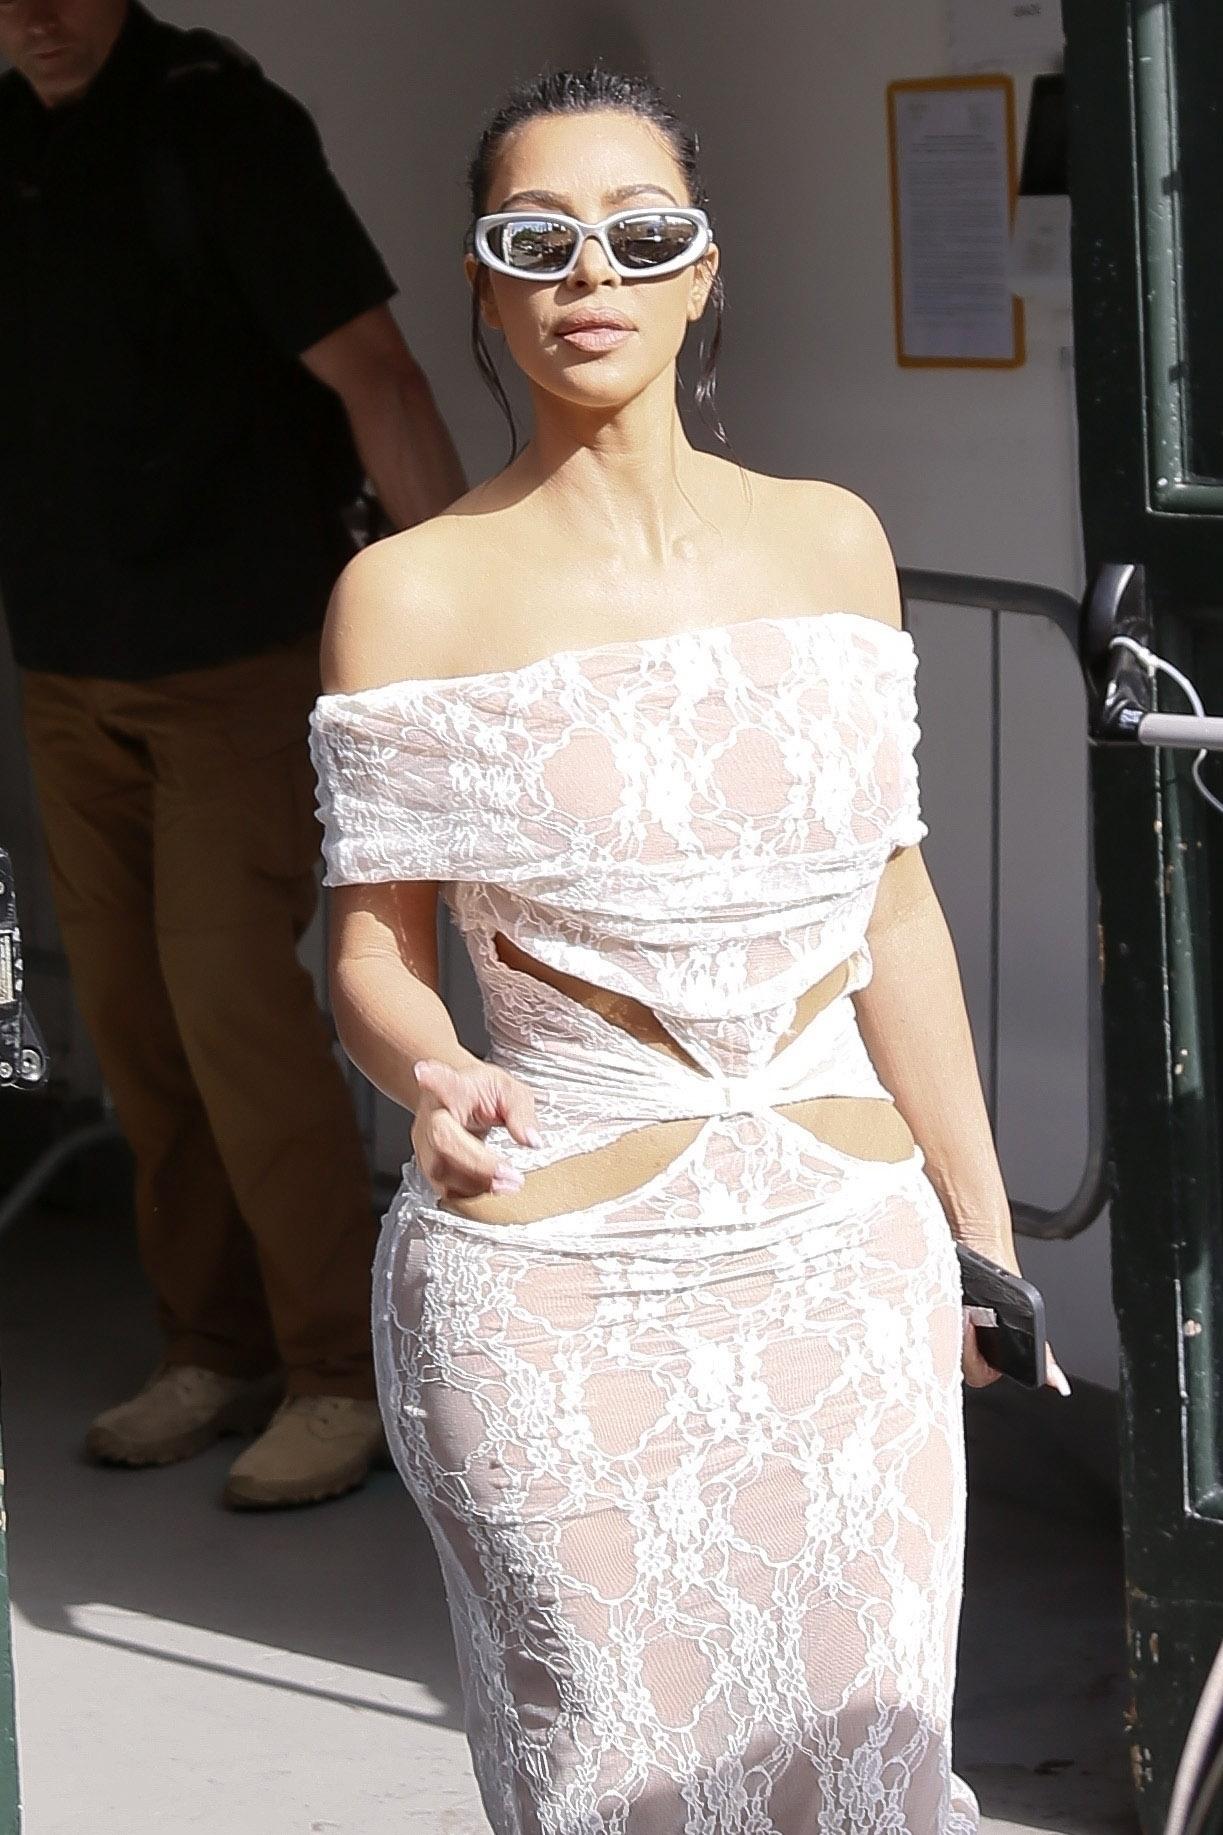 Kim Kardashian Tours the Vatican Wearing a Stunning White Lace Dress